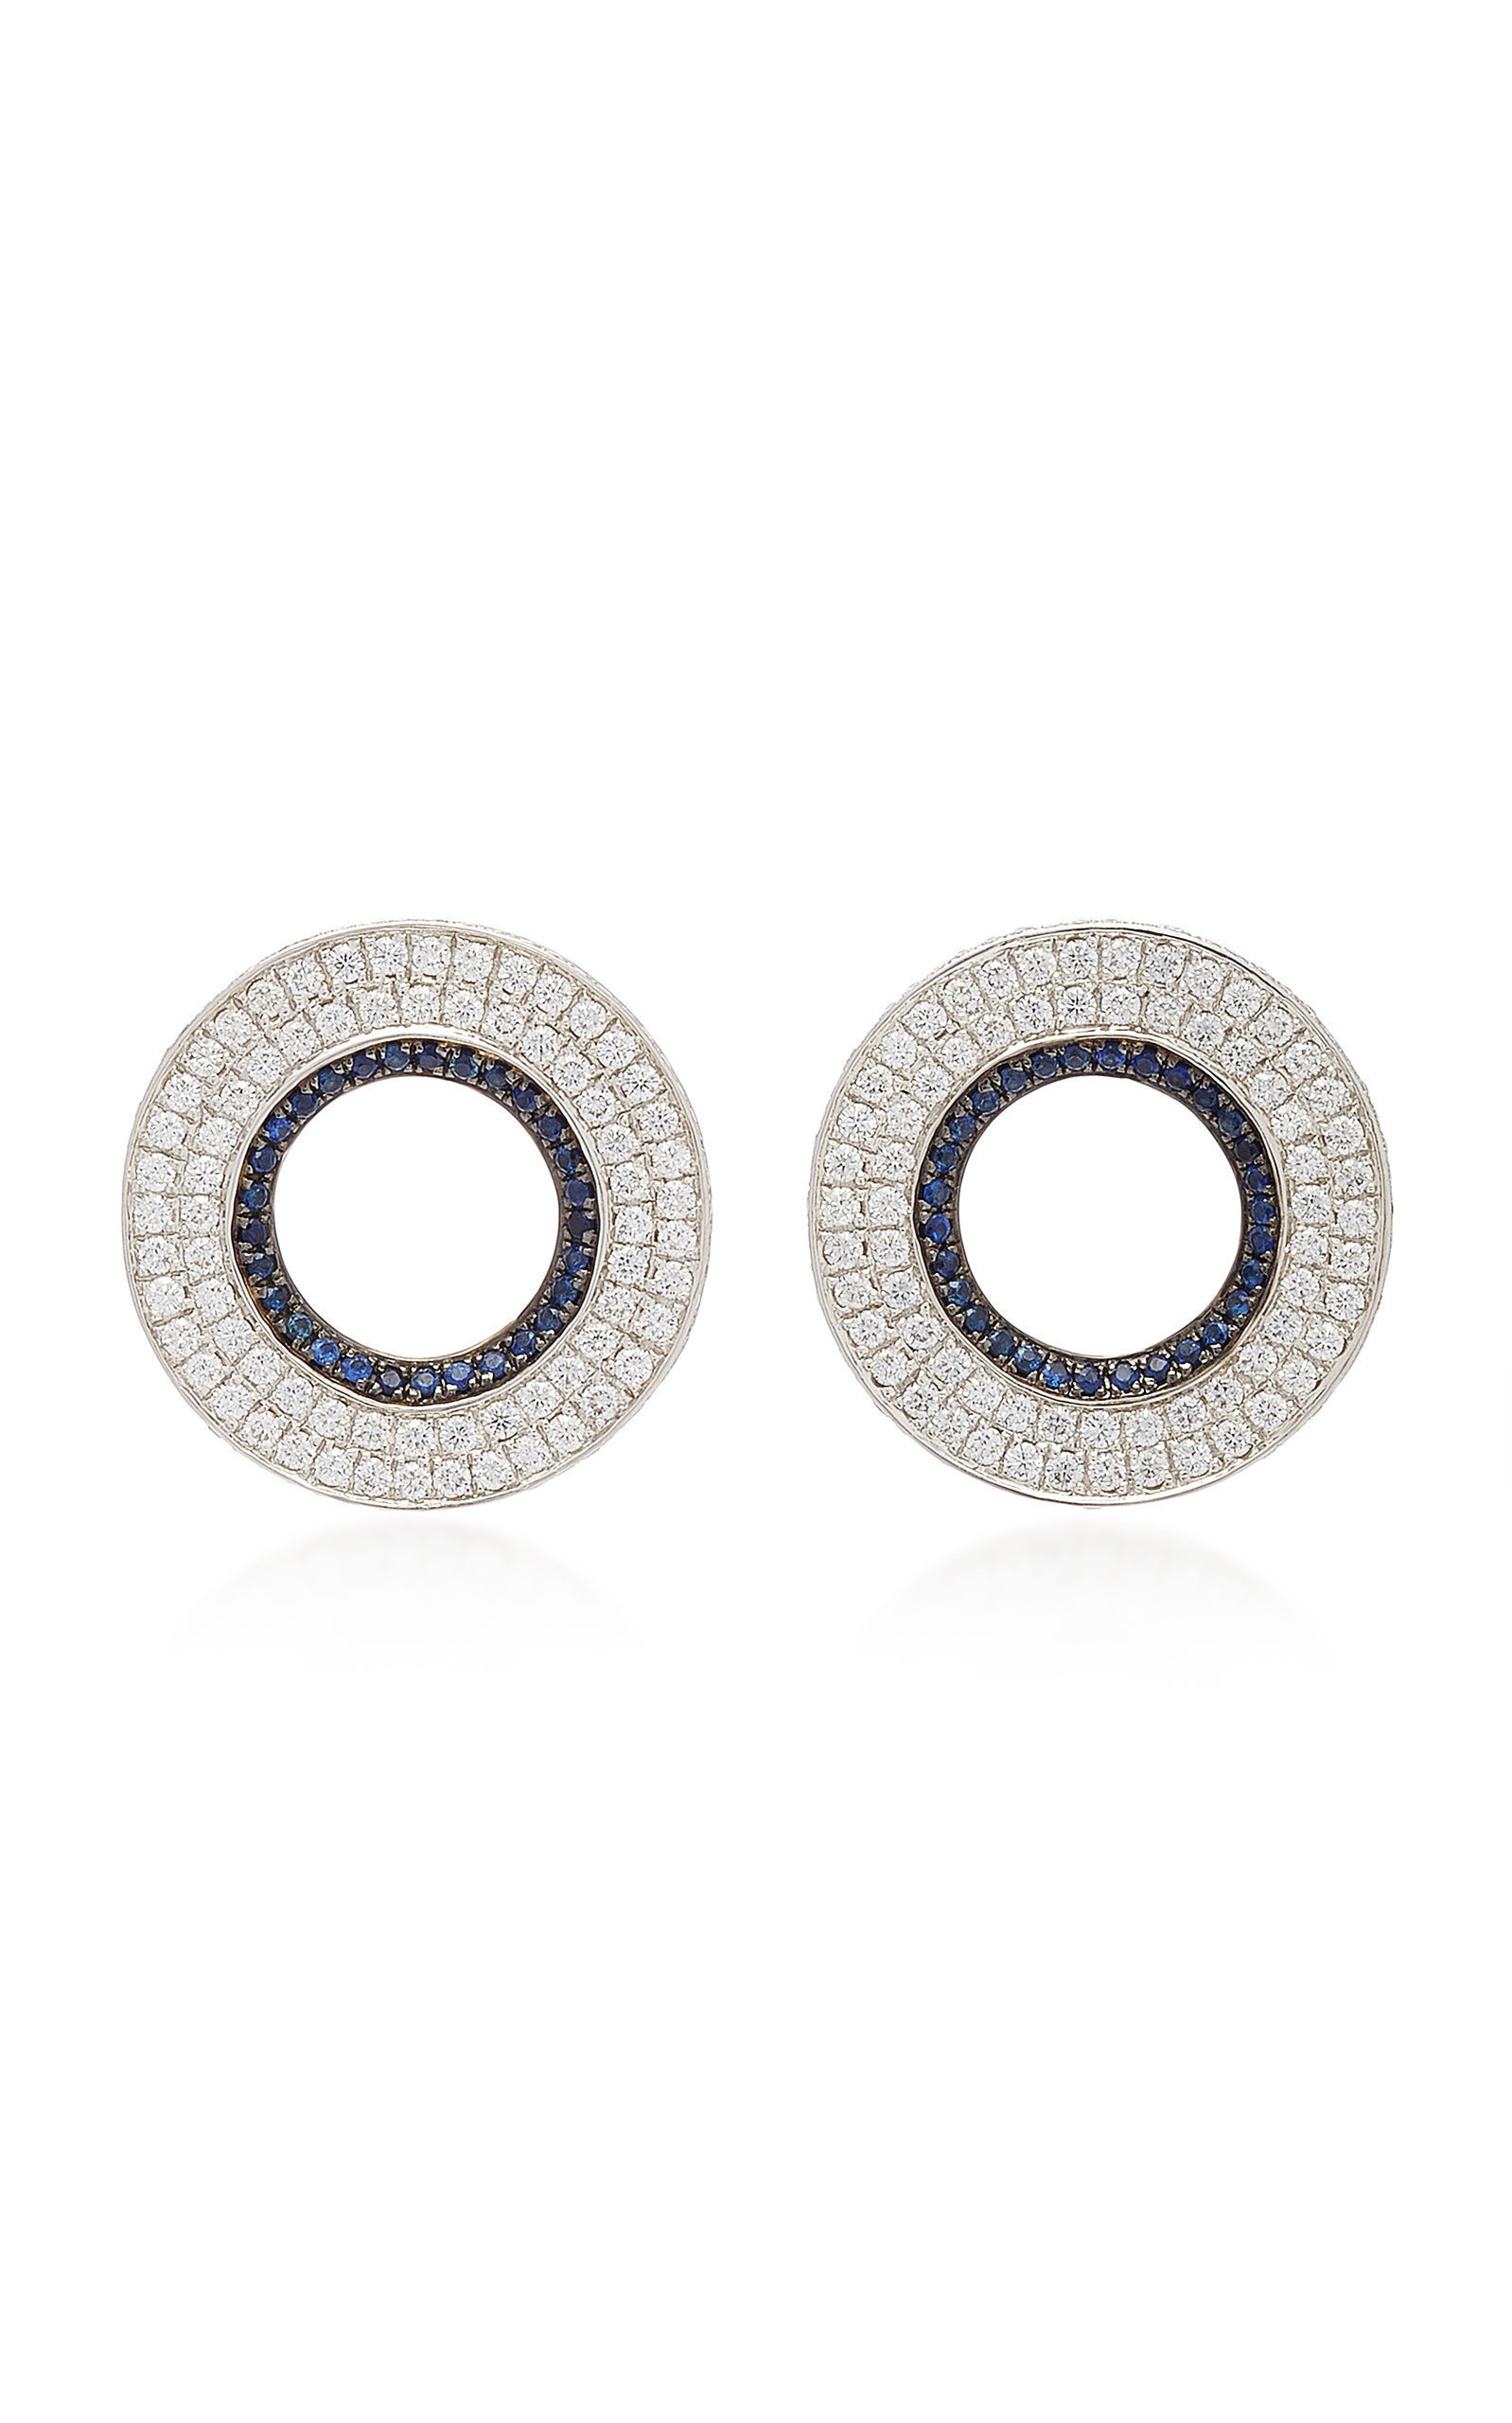 Ralph Masri Modernist Circular Earrings